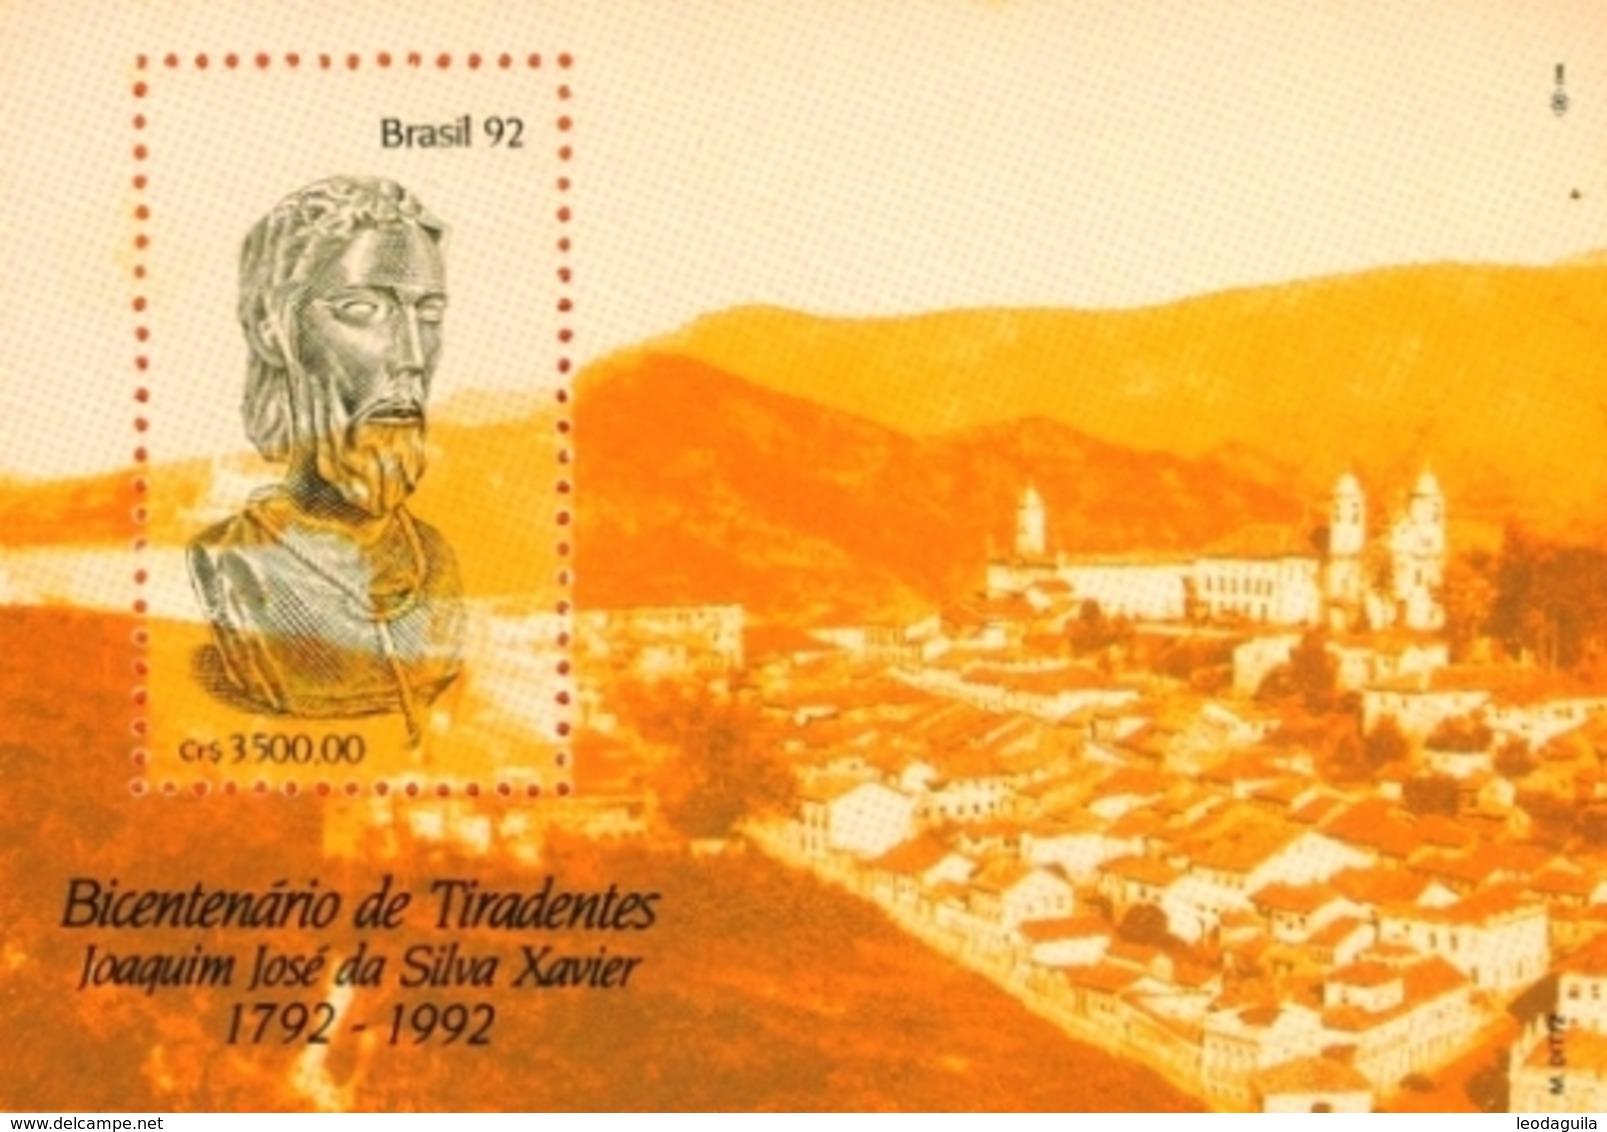 BRAZIL #2378  - HOMMAGE TO TIRADENTES  -  INCONFIDENCE HEROE -1992 - Unused Stamps